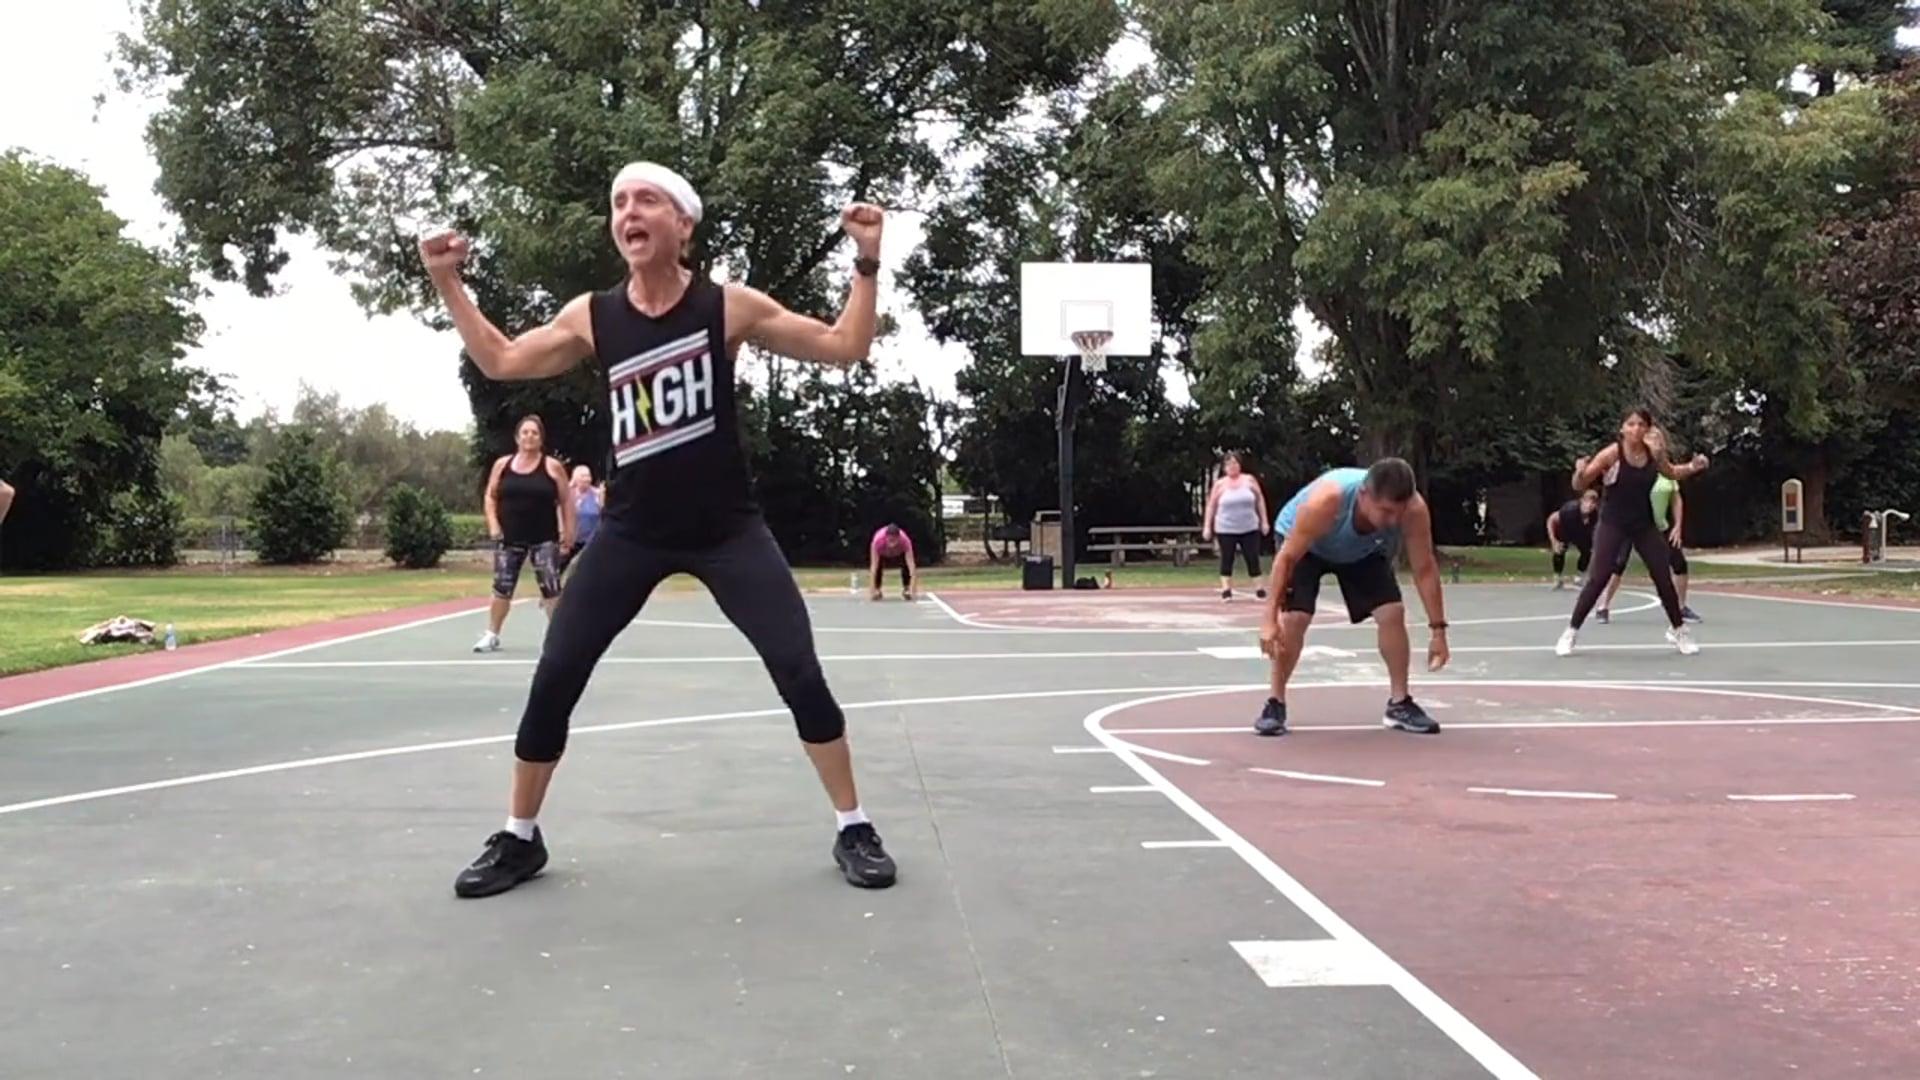 High Fitness Demo